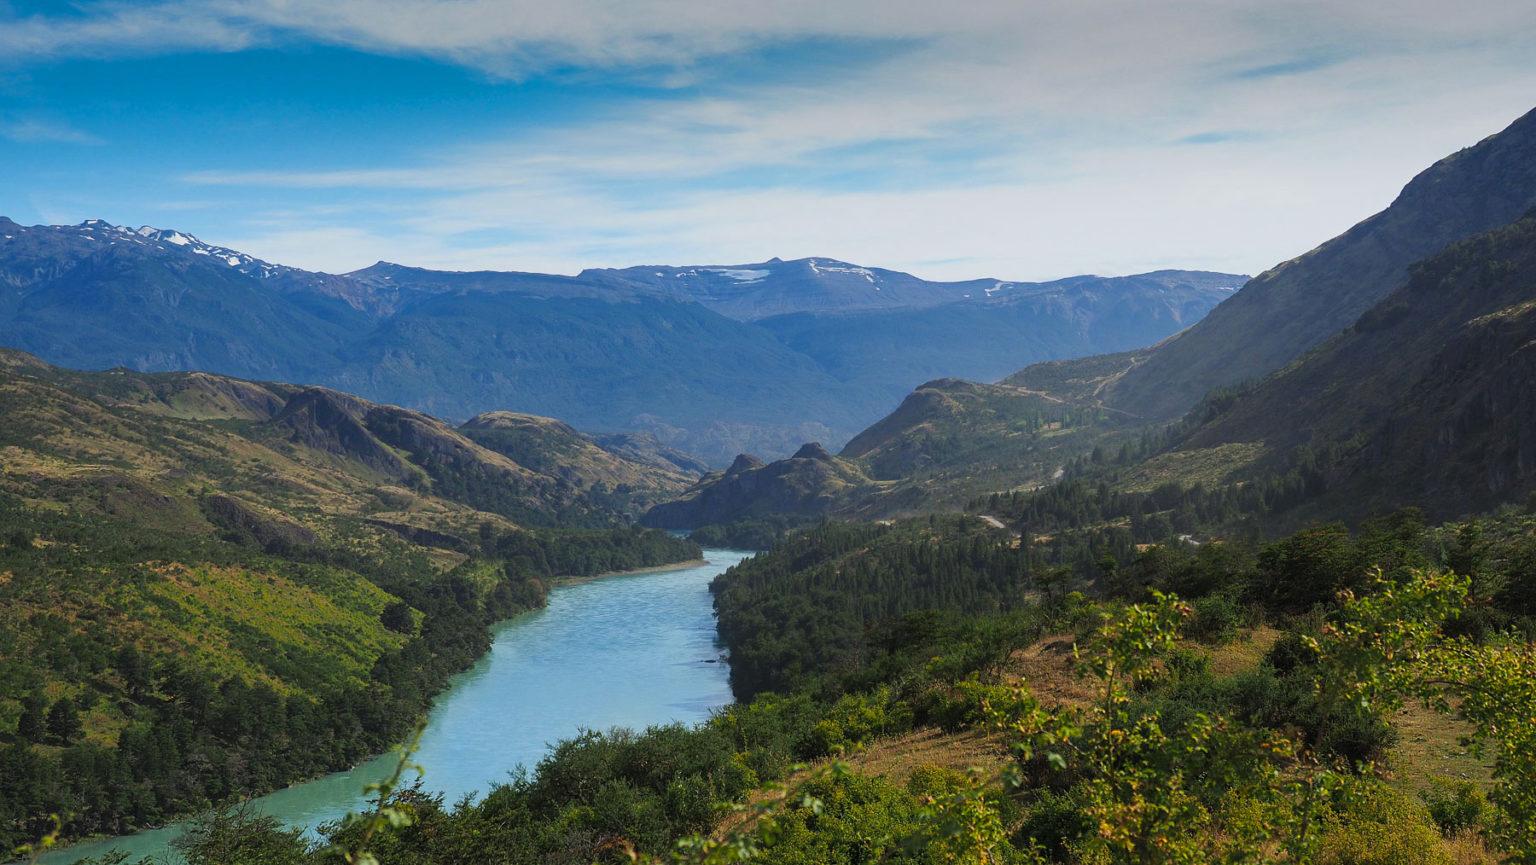 Im Süden Chiles entlang der legendären Carretera Austral